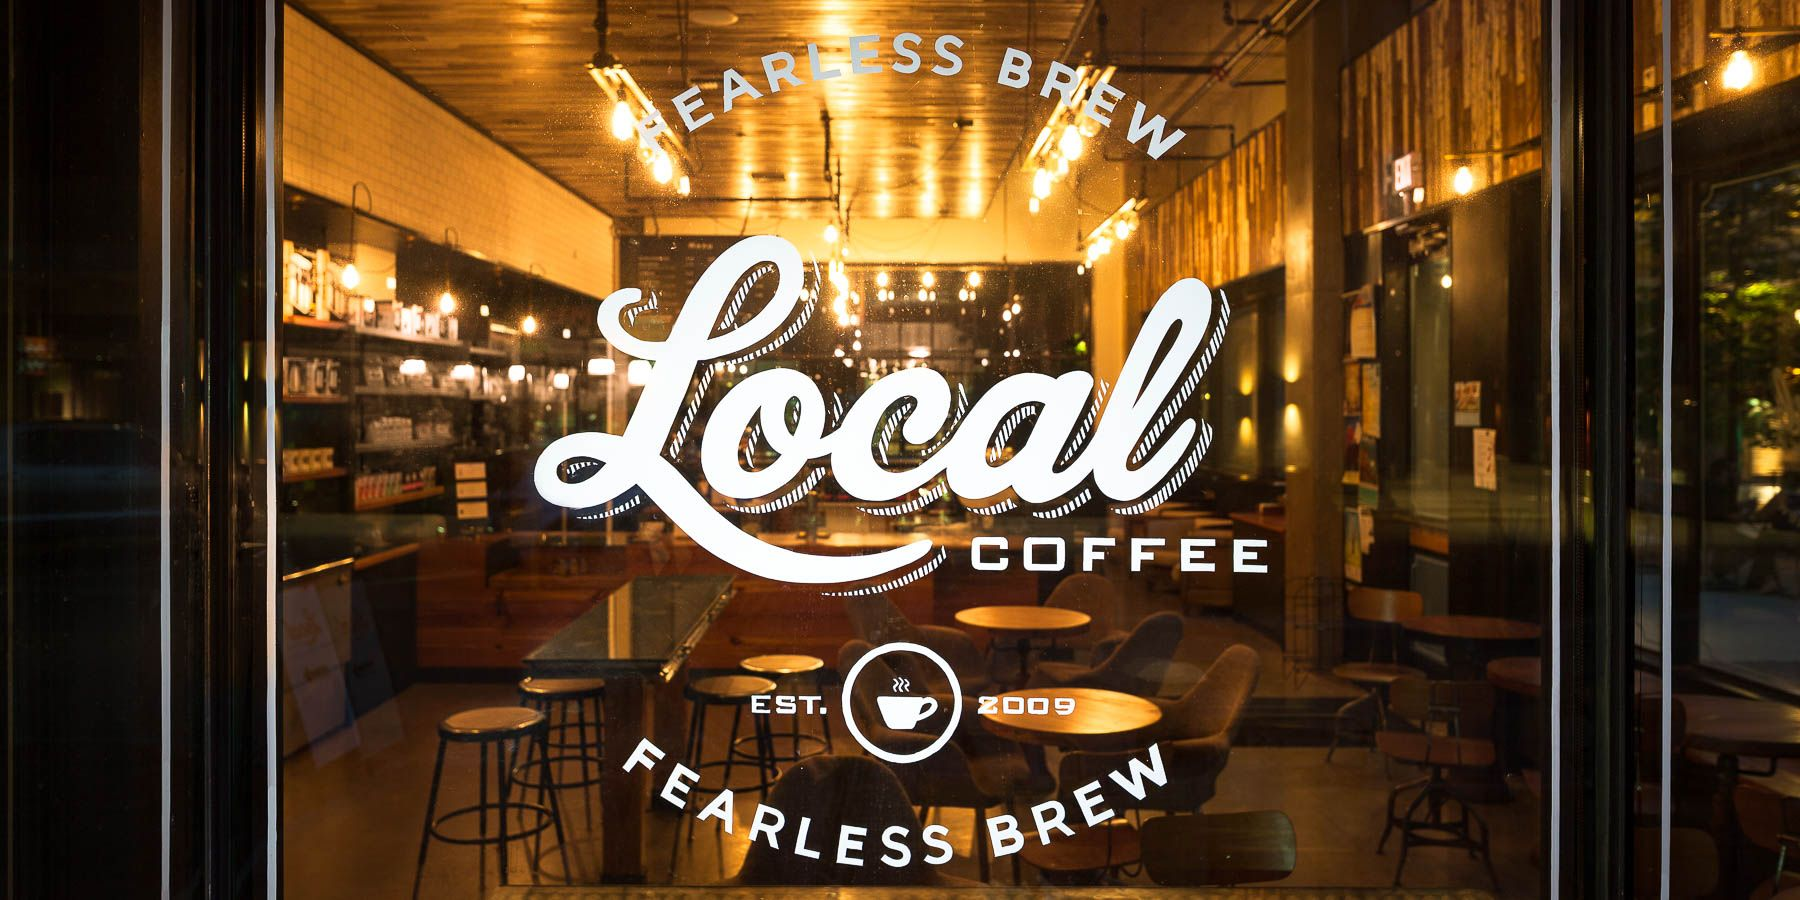 Local Coffee - San Antonio, Texas | Local coffee, Coffee shop design, San antonio